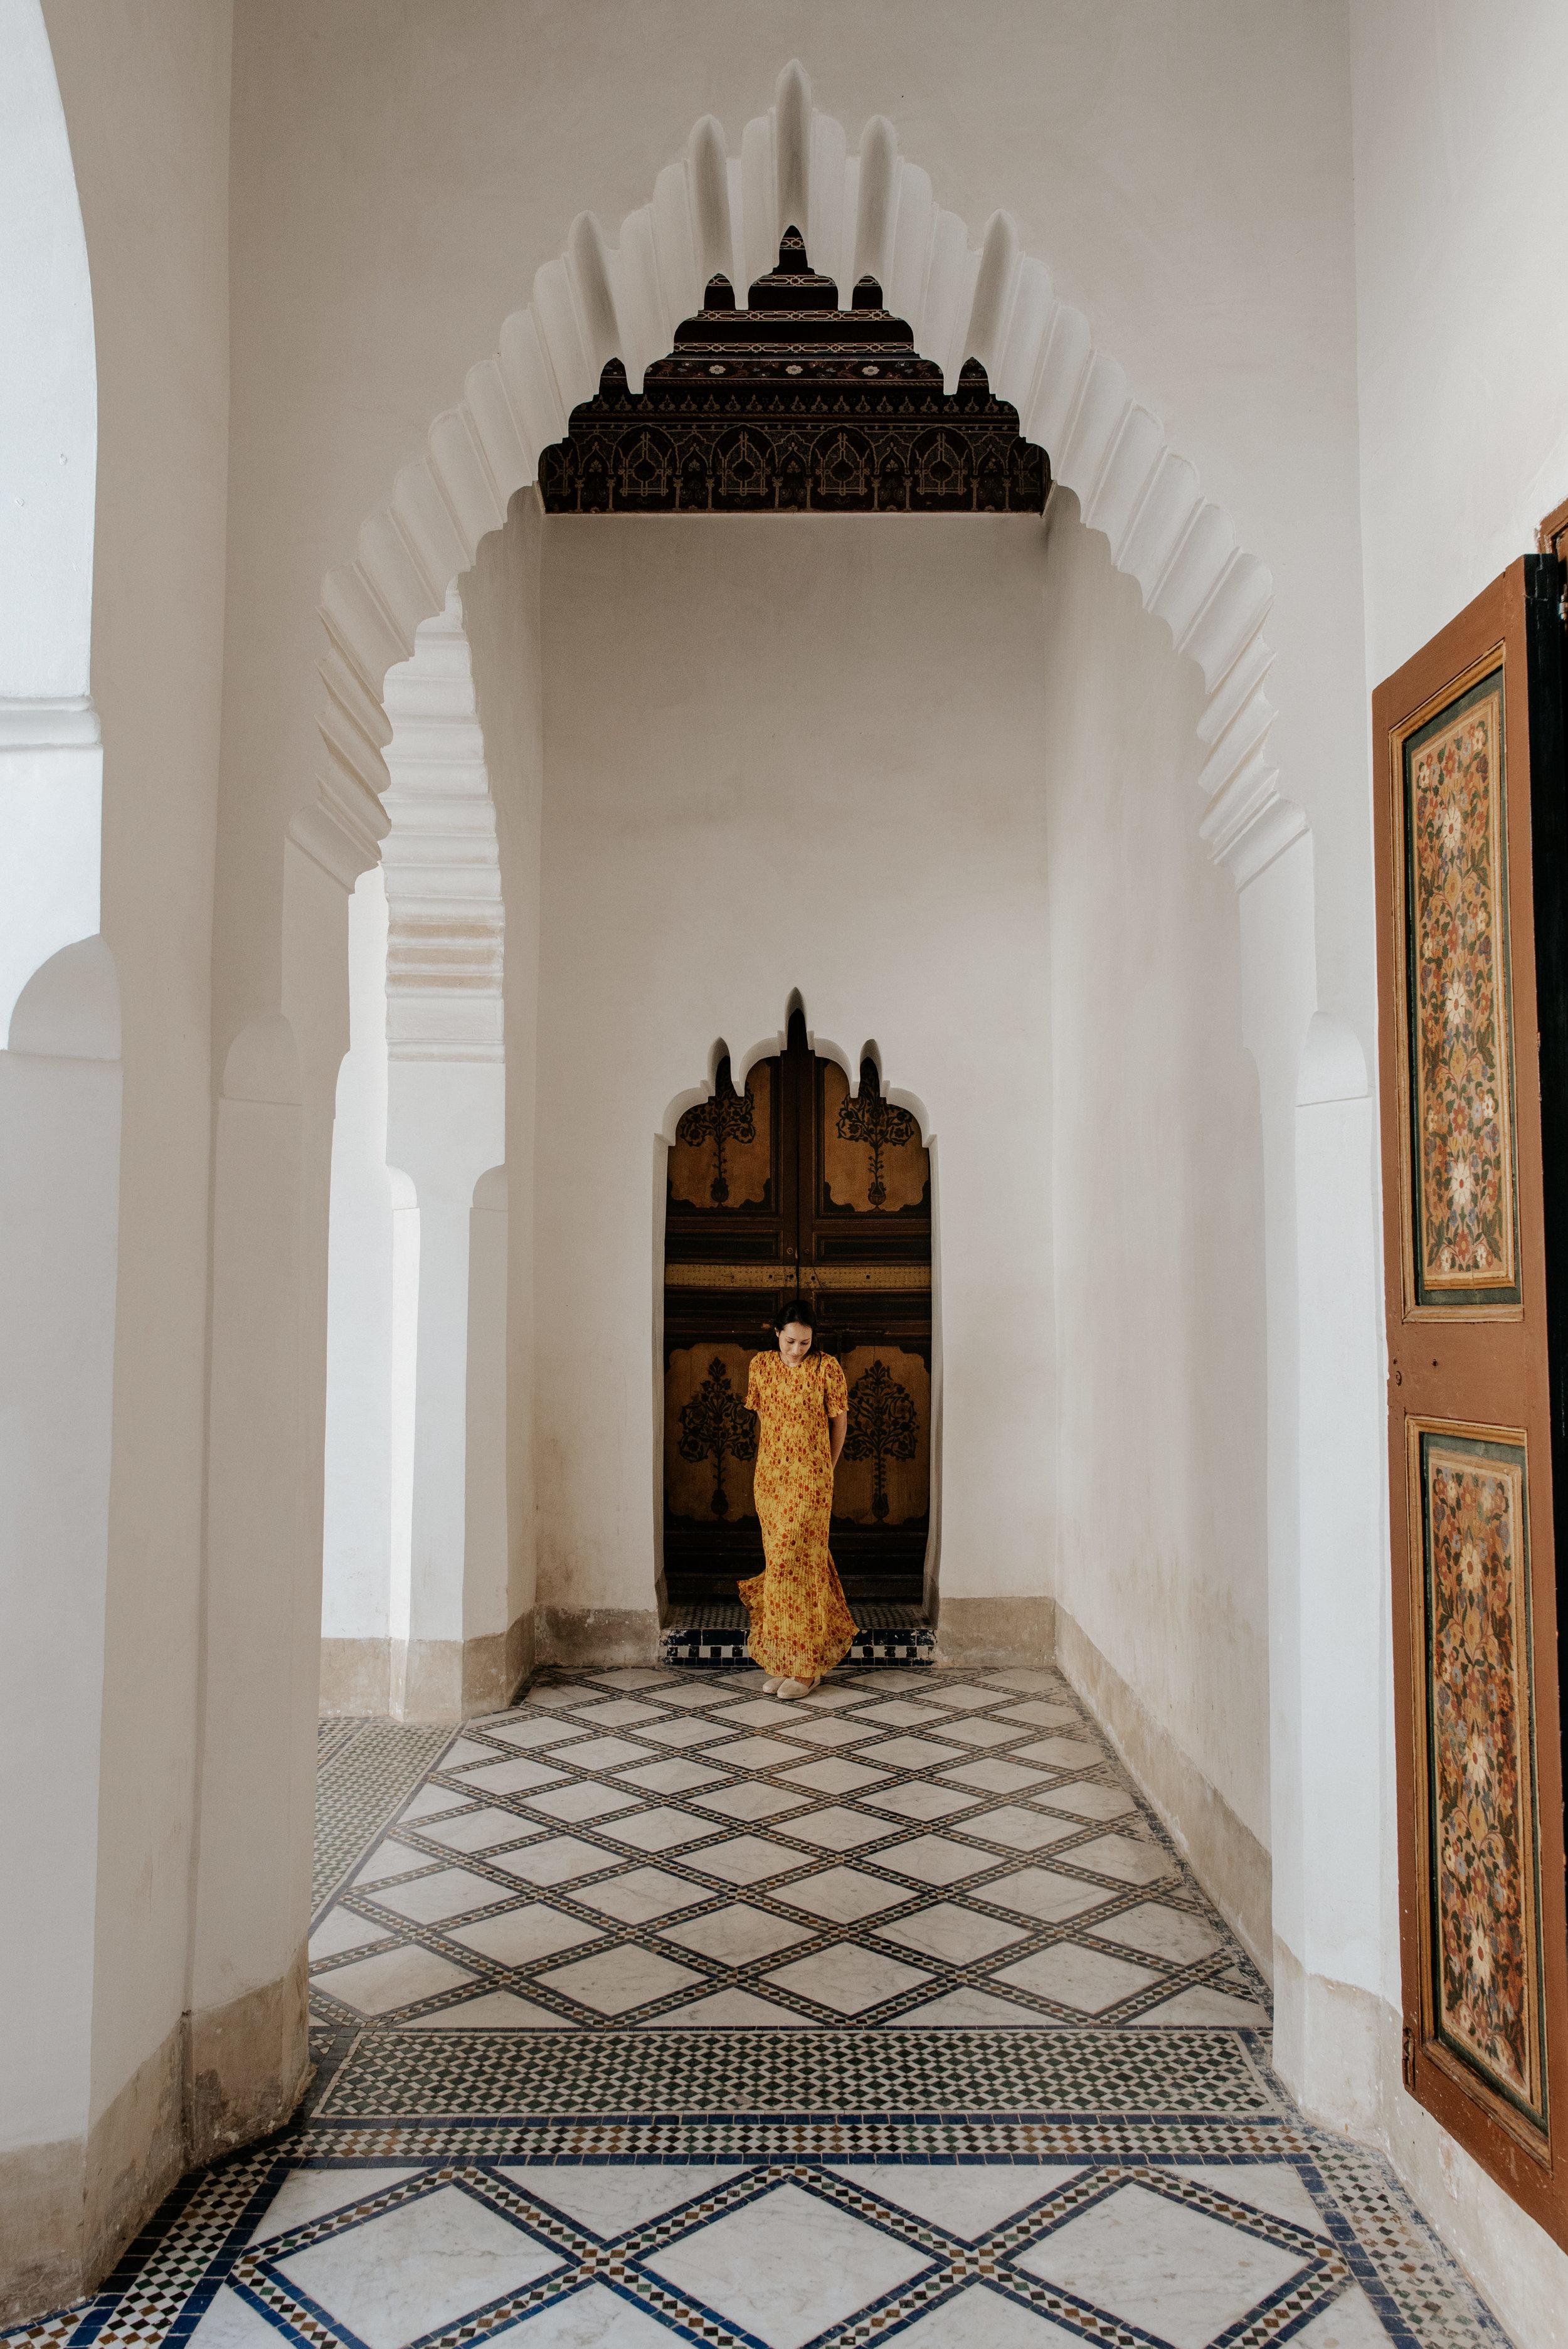 La Bahia Palace